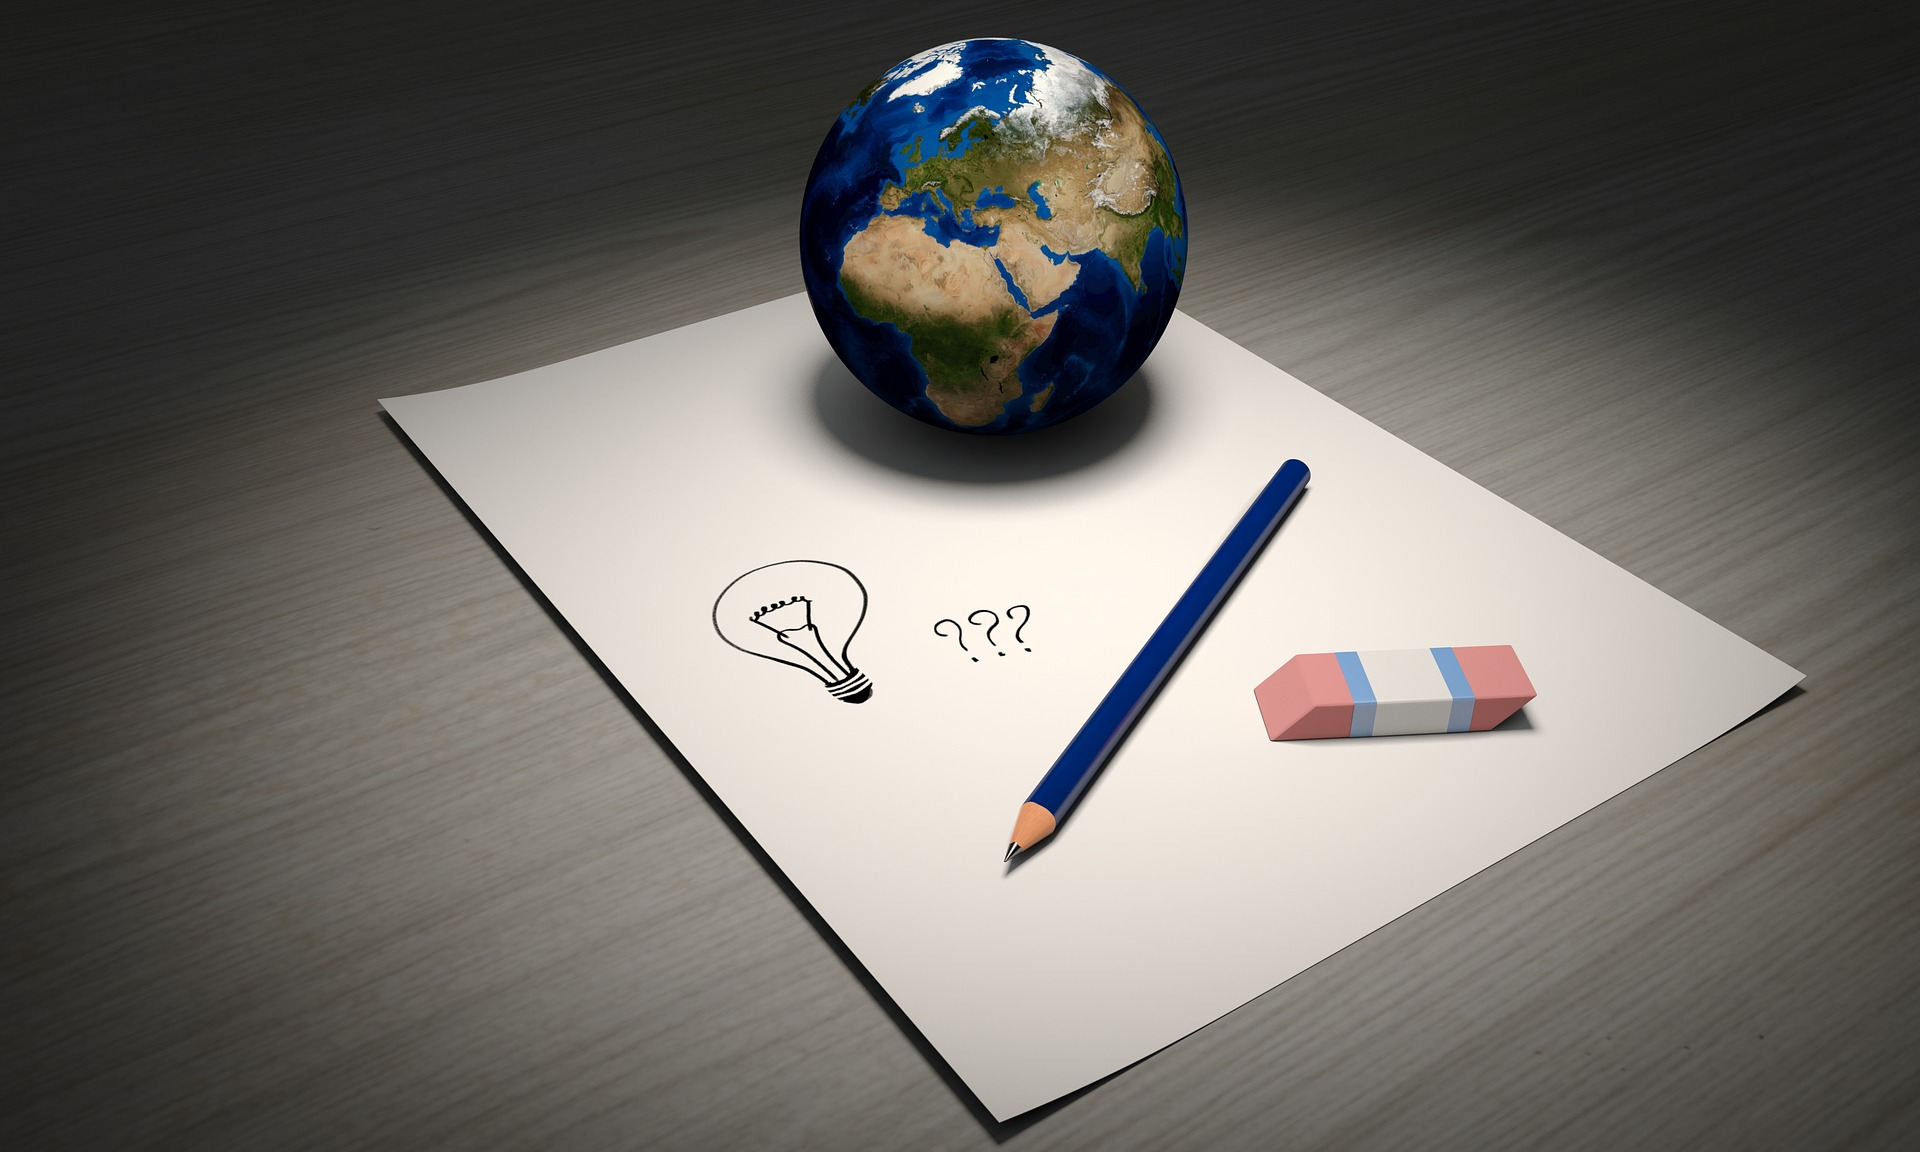 Inovatie, electricitate - sursa: Pixabay